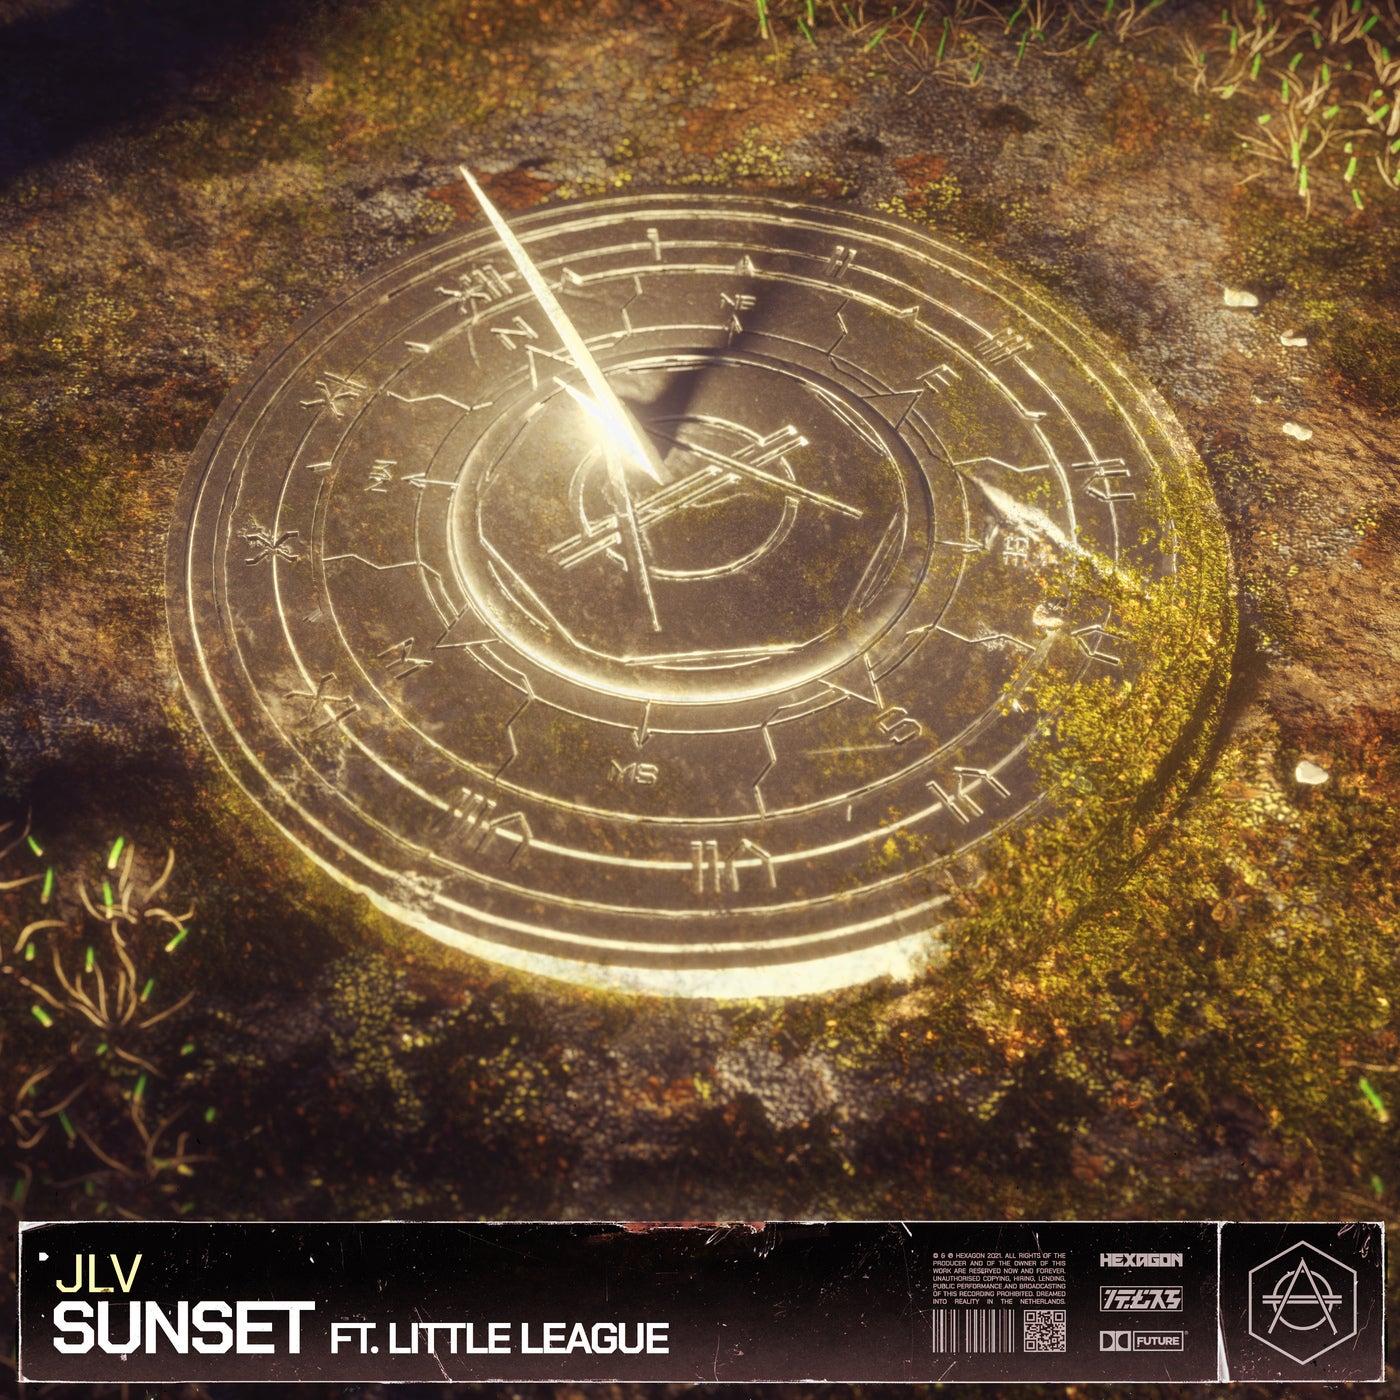 Sunset feat. Little League (Extended Mix)